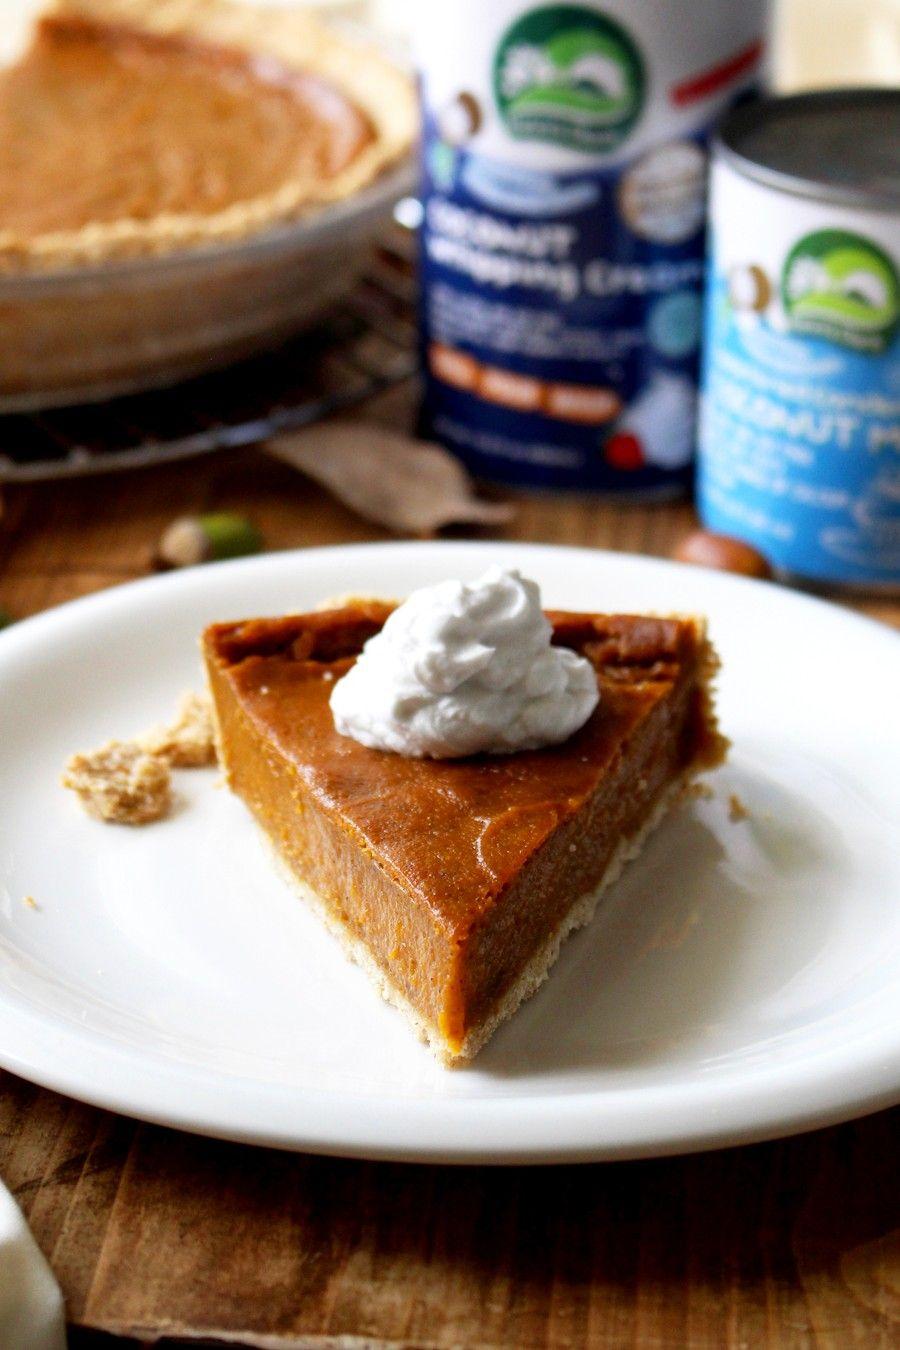 Sushiday Vegan Pumpkin Pie Gluten Free Recipes Baking Gluten Free Baking